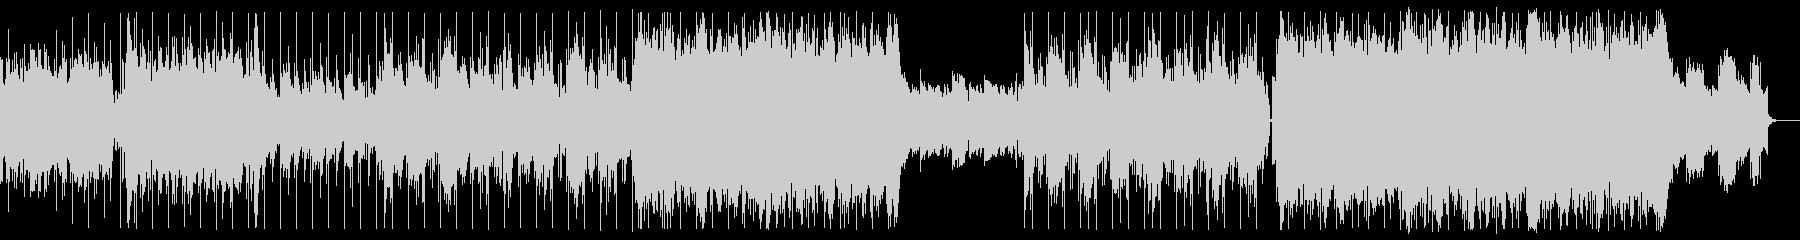 EDMなサウンドが印象的なアップテンポの未再生の波形